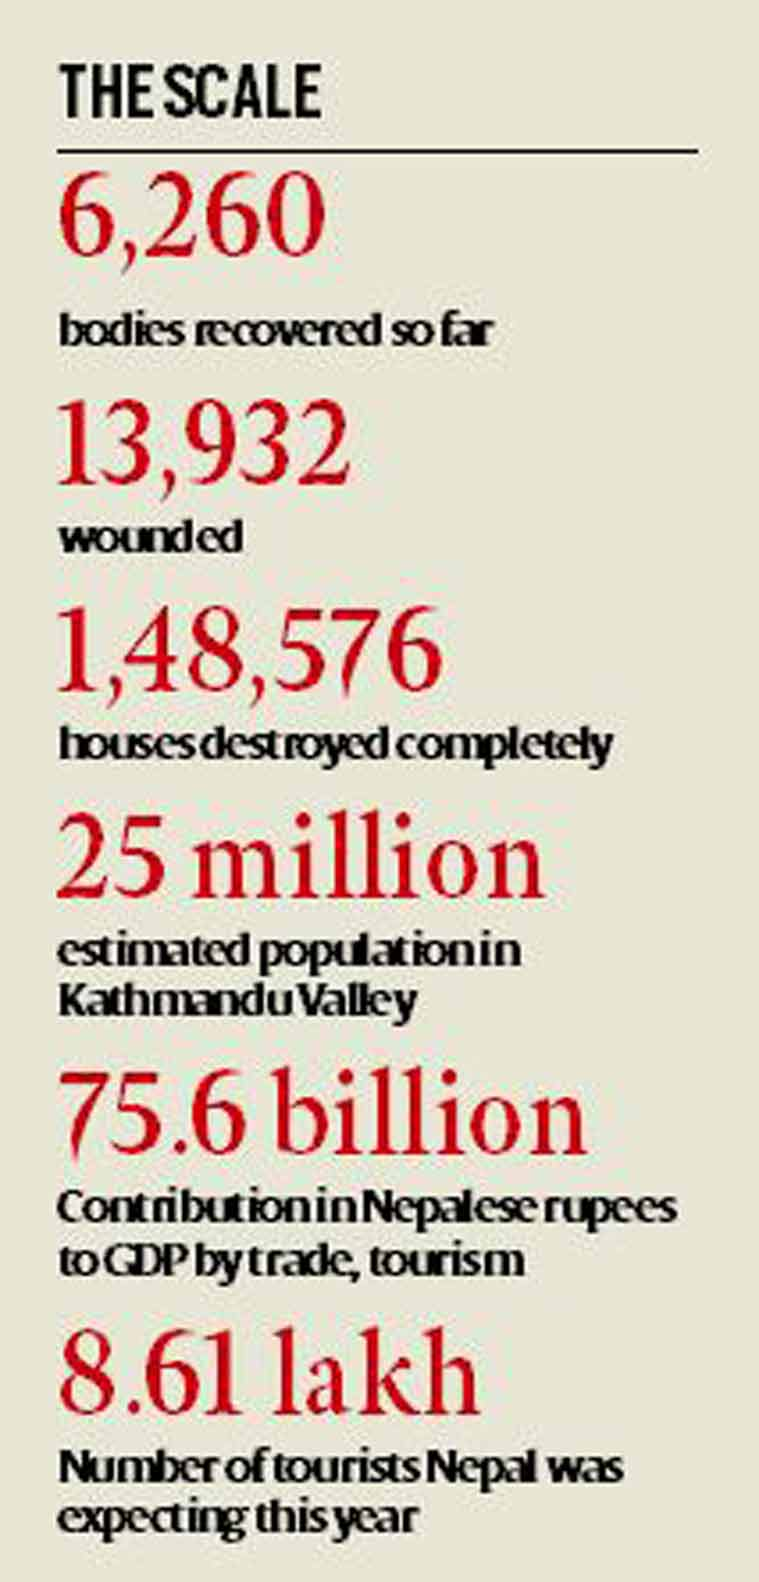 Nepal Earthquake, Nepal, Earthquake, Kathmandu earthquake, nepal earthquake 2015, nepal earthquake disasters, nepal news, indian express big picture, big picture, indian express